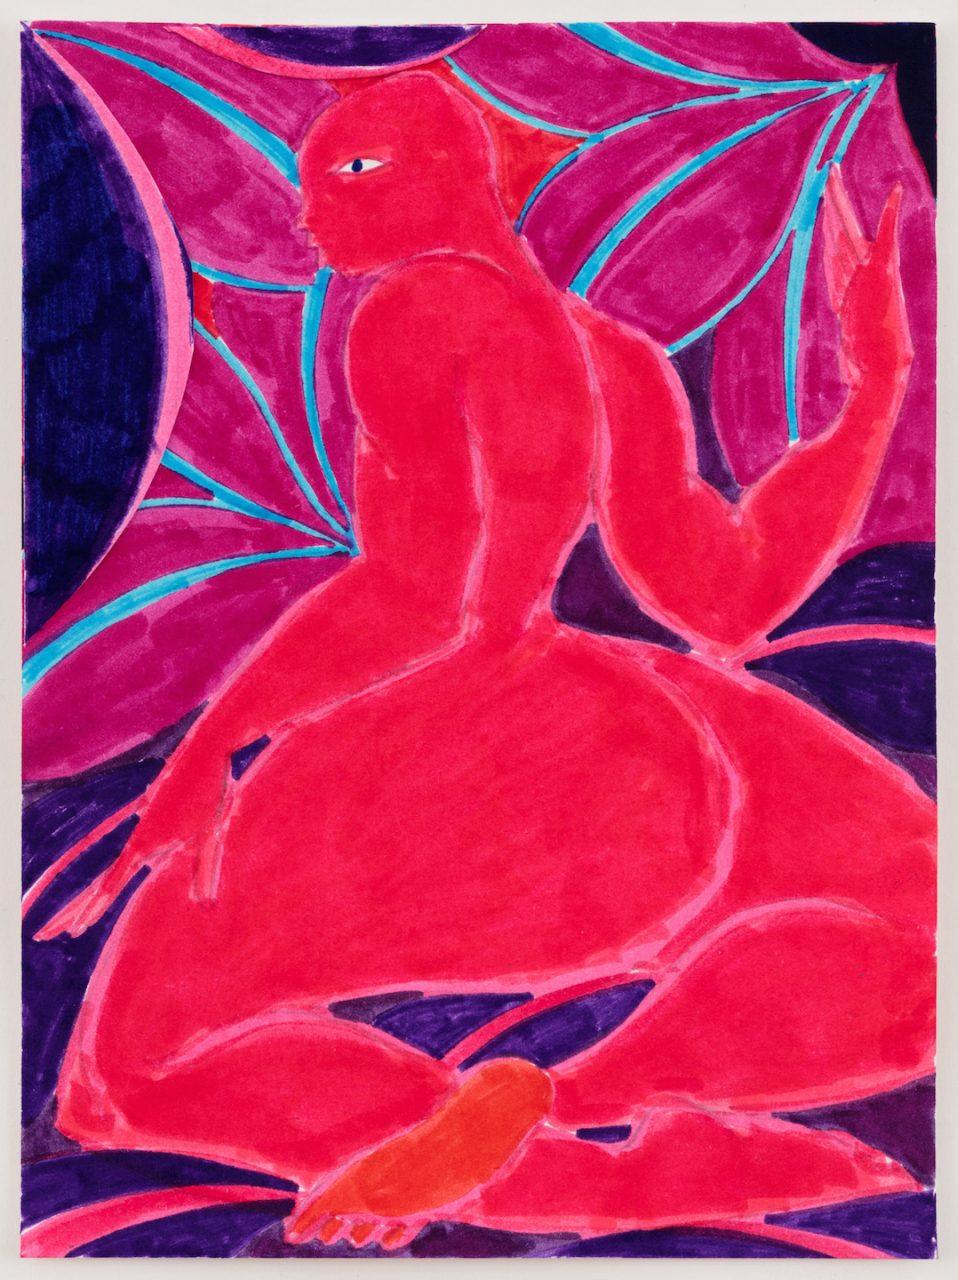 Works on Paper | Tunji Adeniyi-Jones